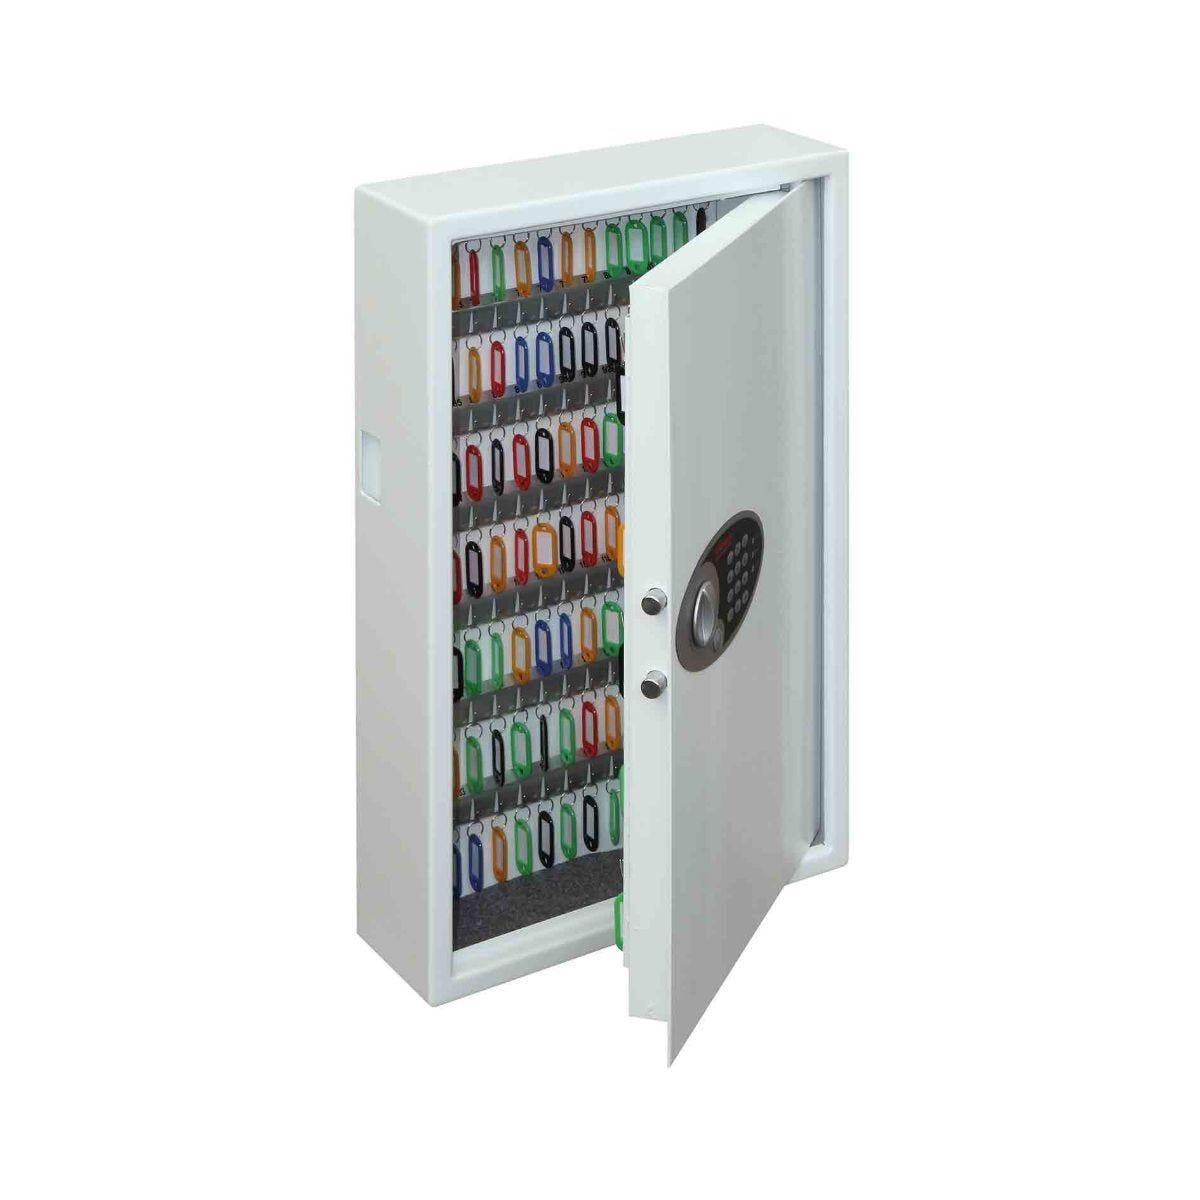 Phoenix Cygnus KS0033E Key Deposit Safe with Electronic Lock 144 Hook